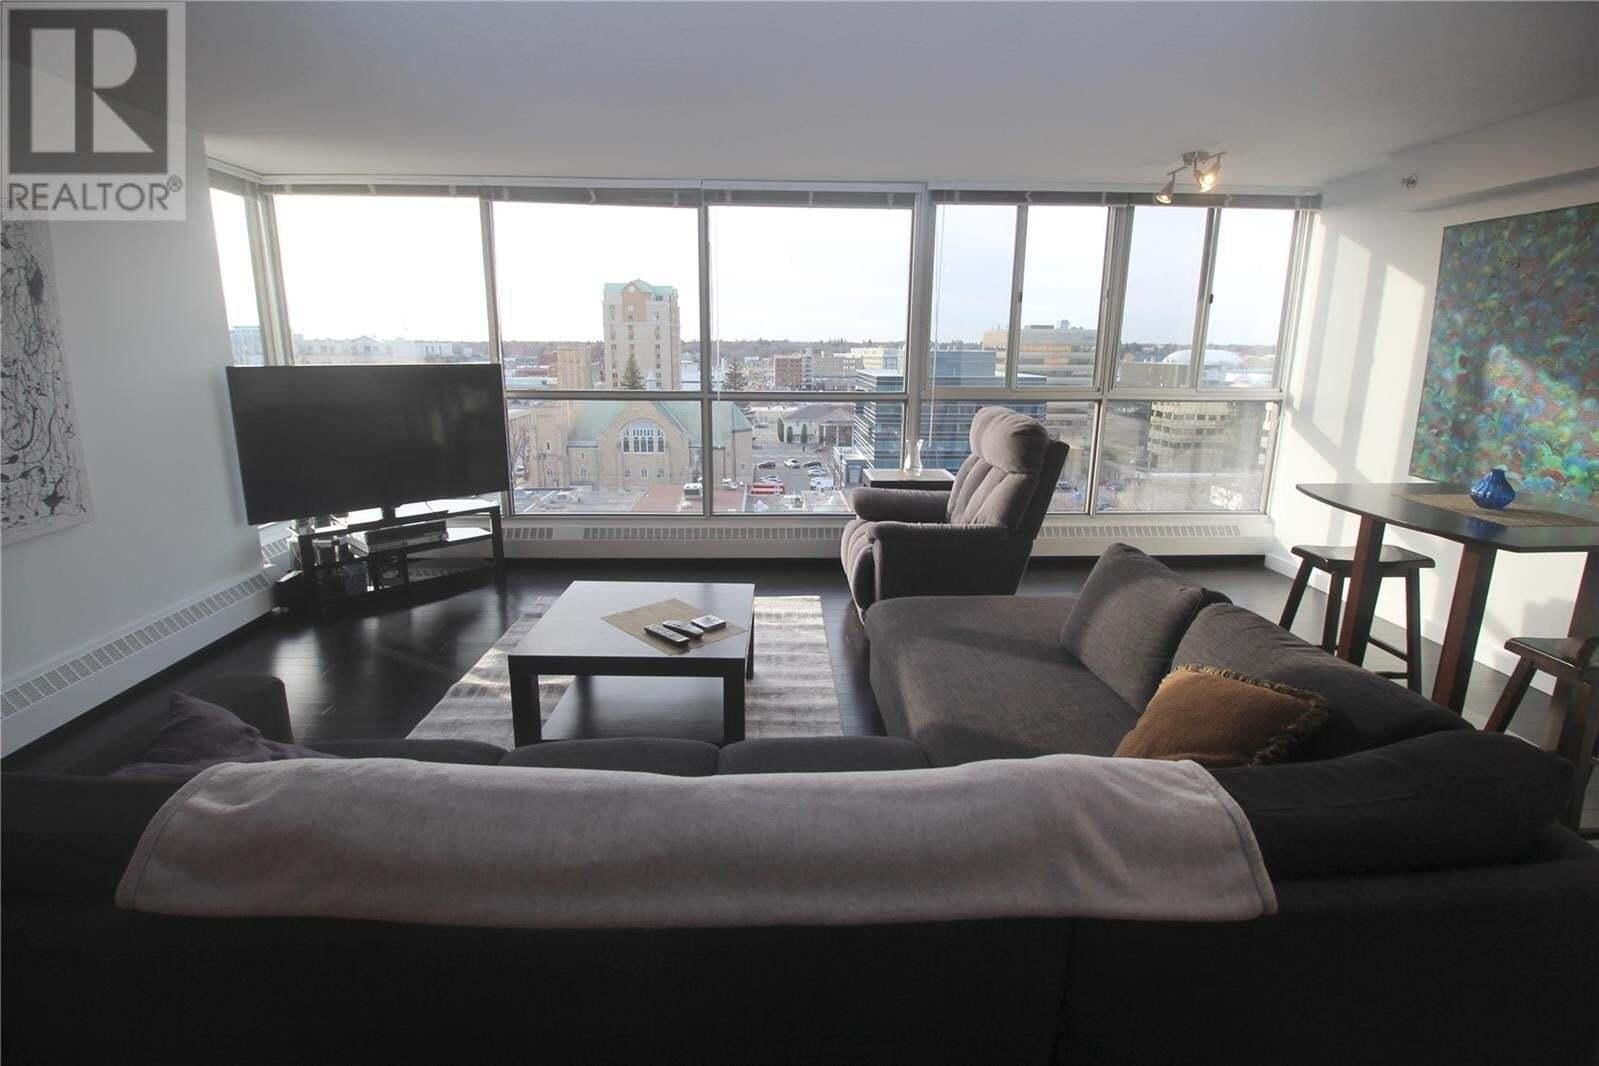 Condo for sale at 315 5th Ave N Unit 1105 Saskatoon Saskatchewan - MLS: SK830941